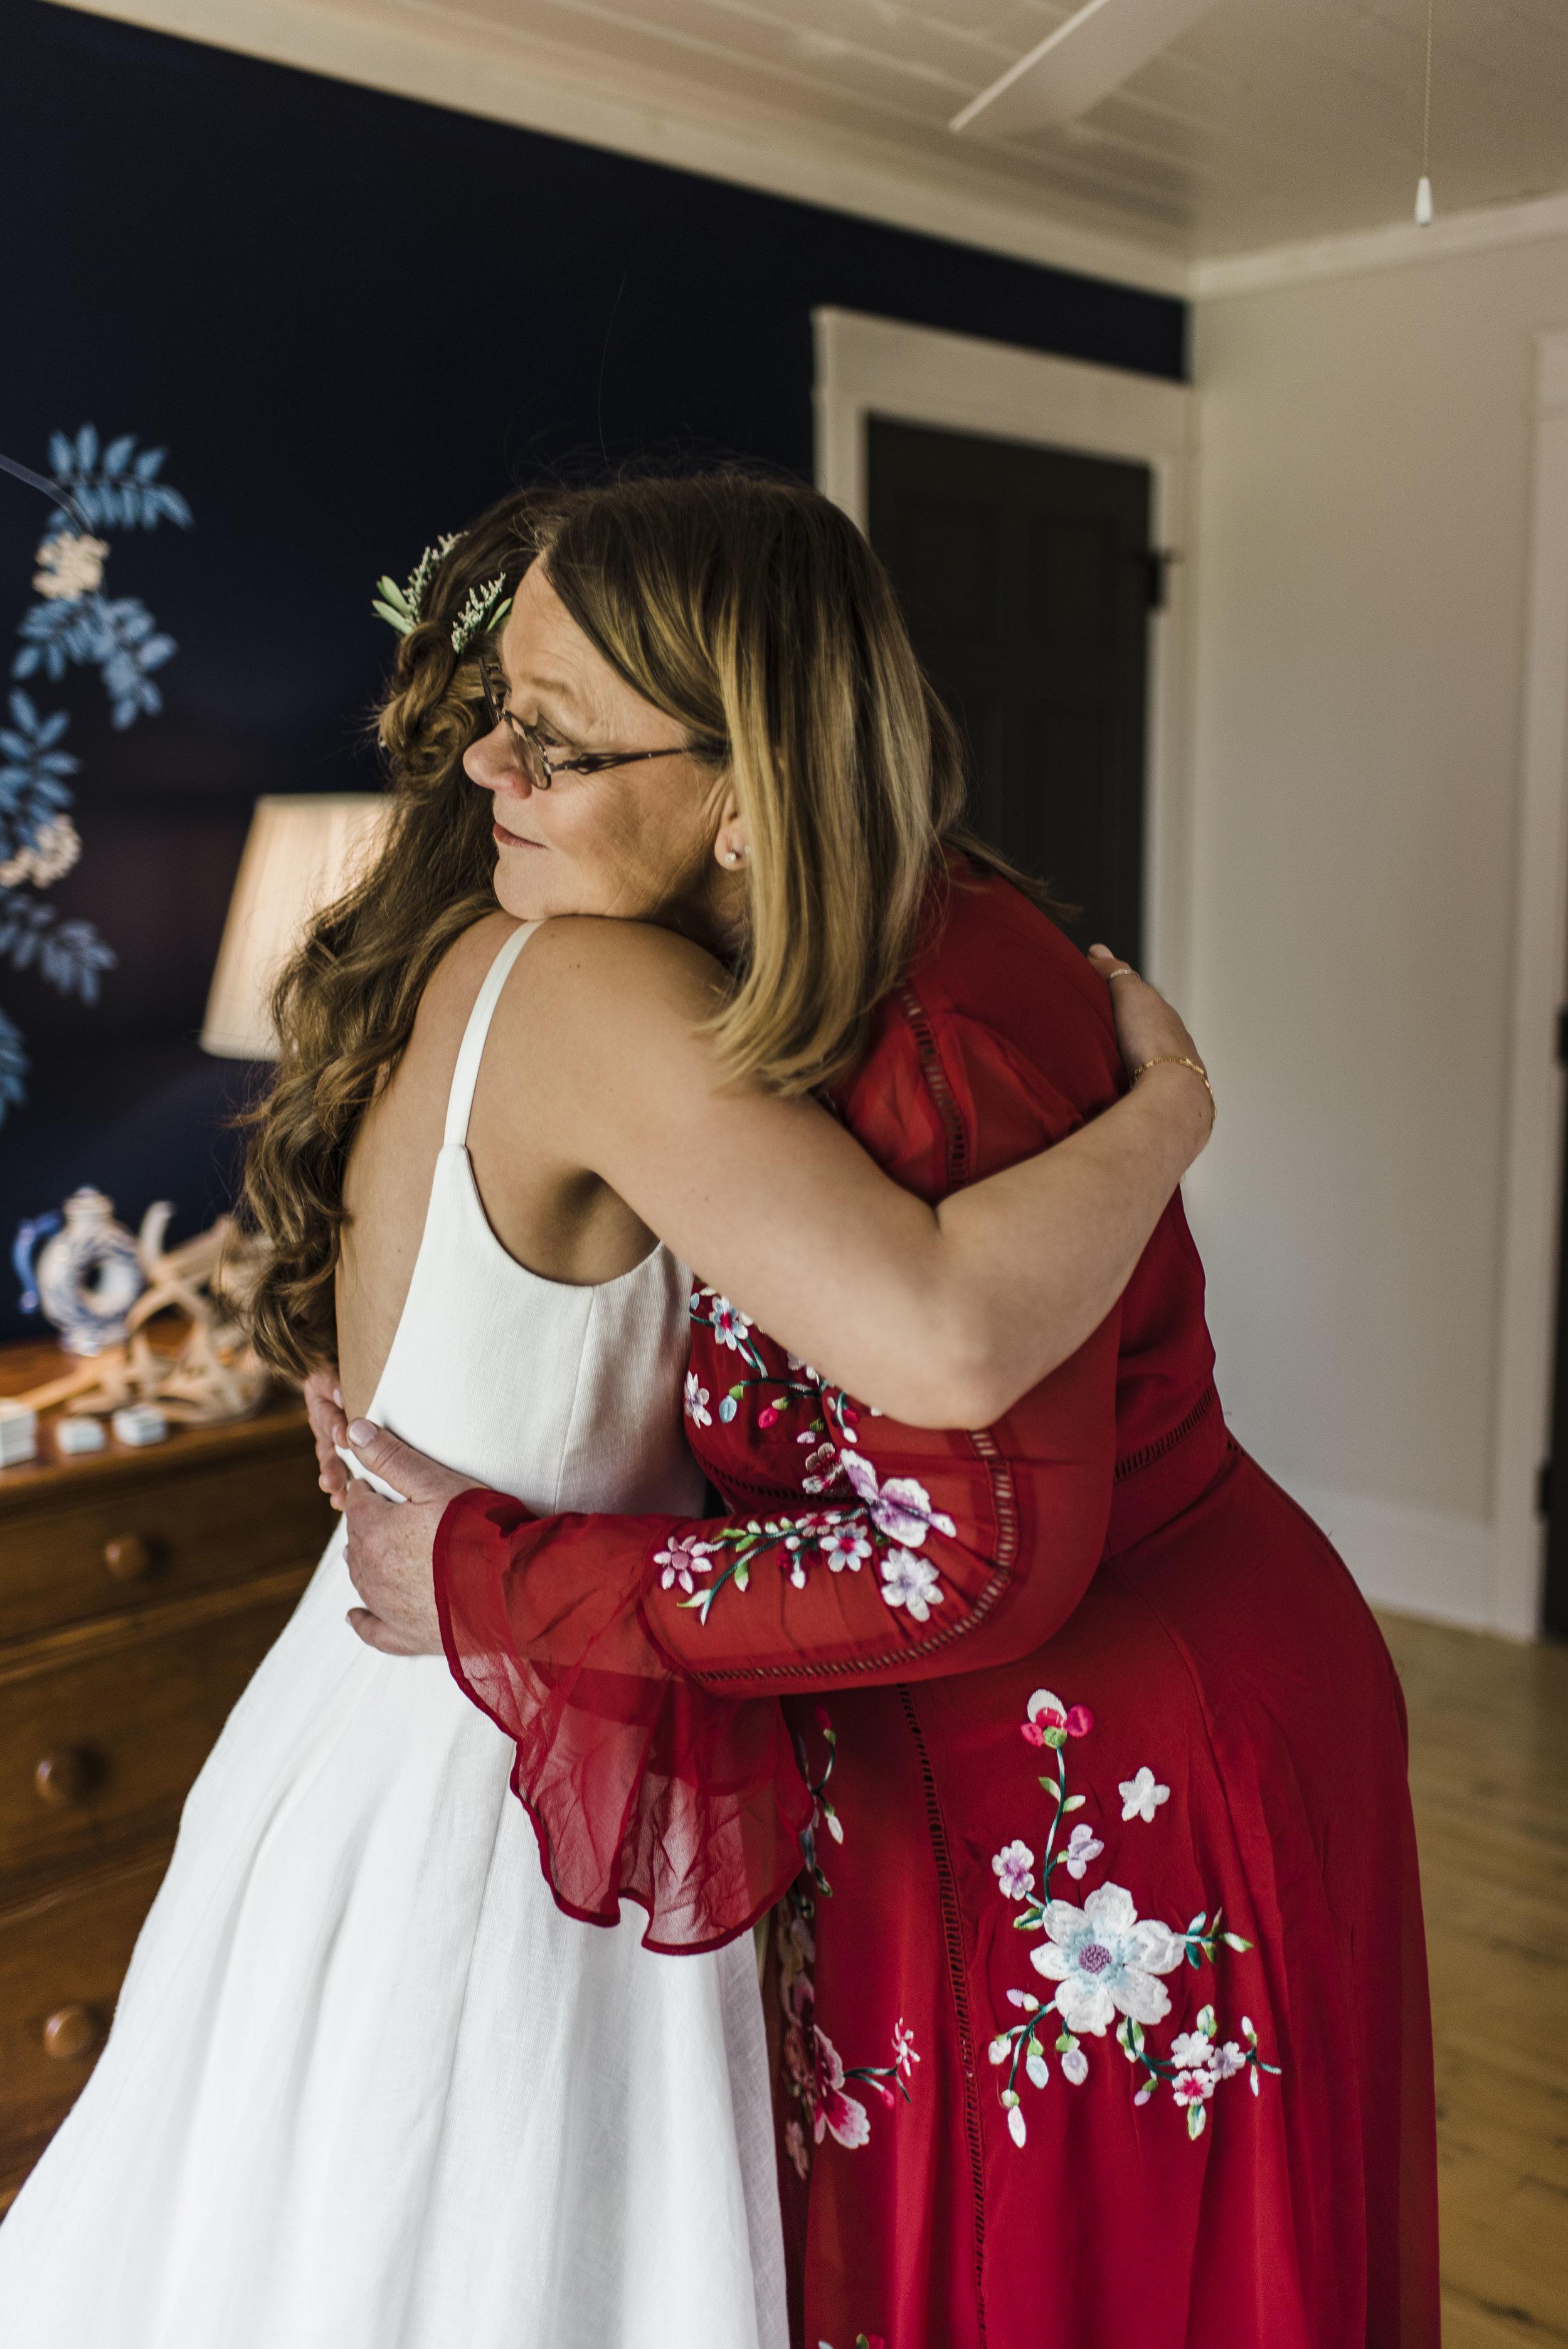 wedding bride dress mom hug chattanooga Tennessee